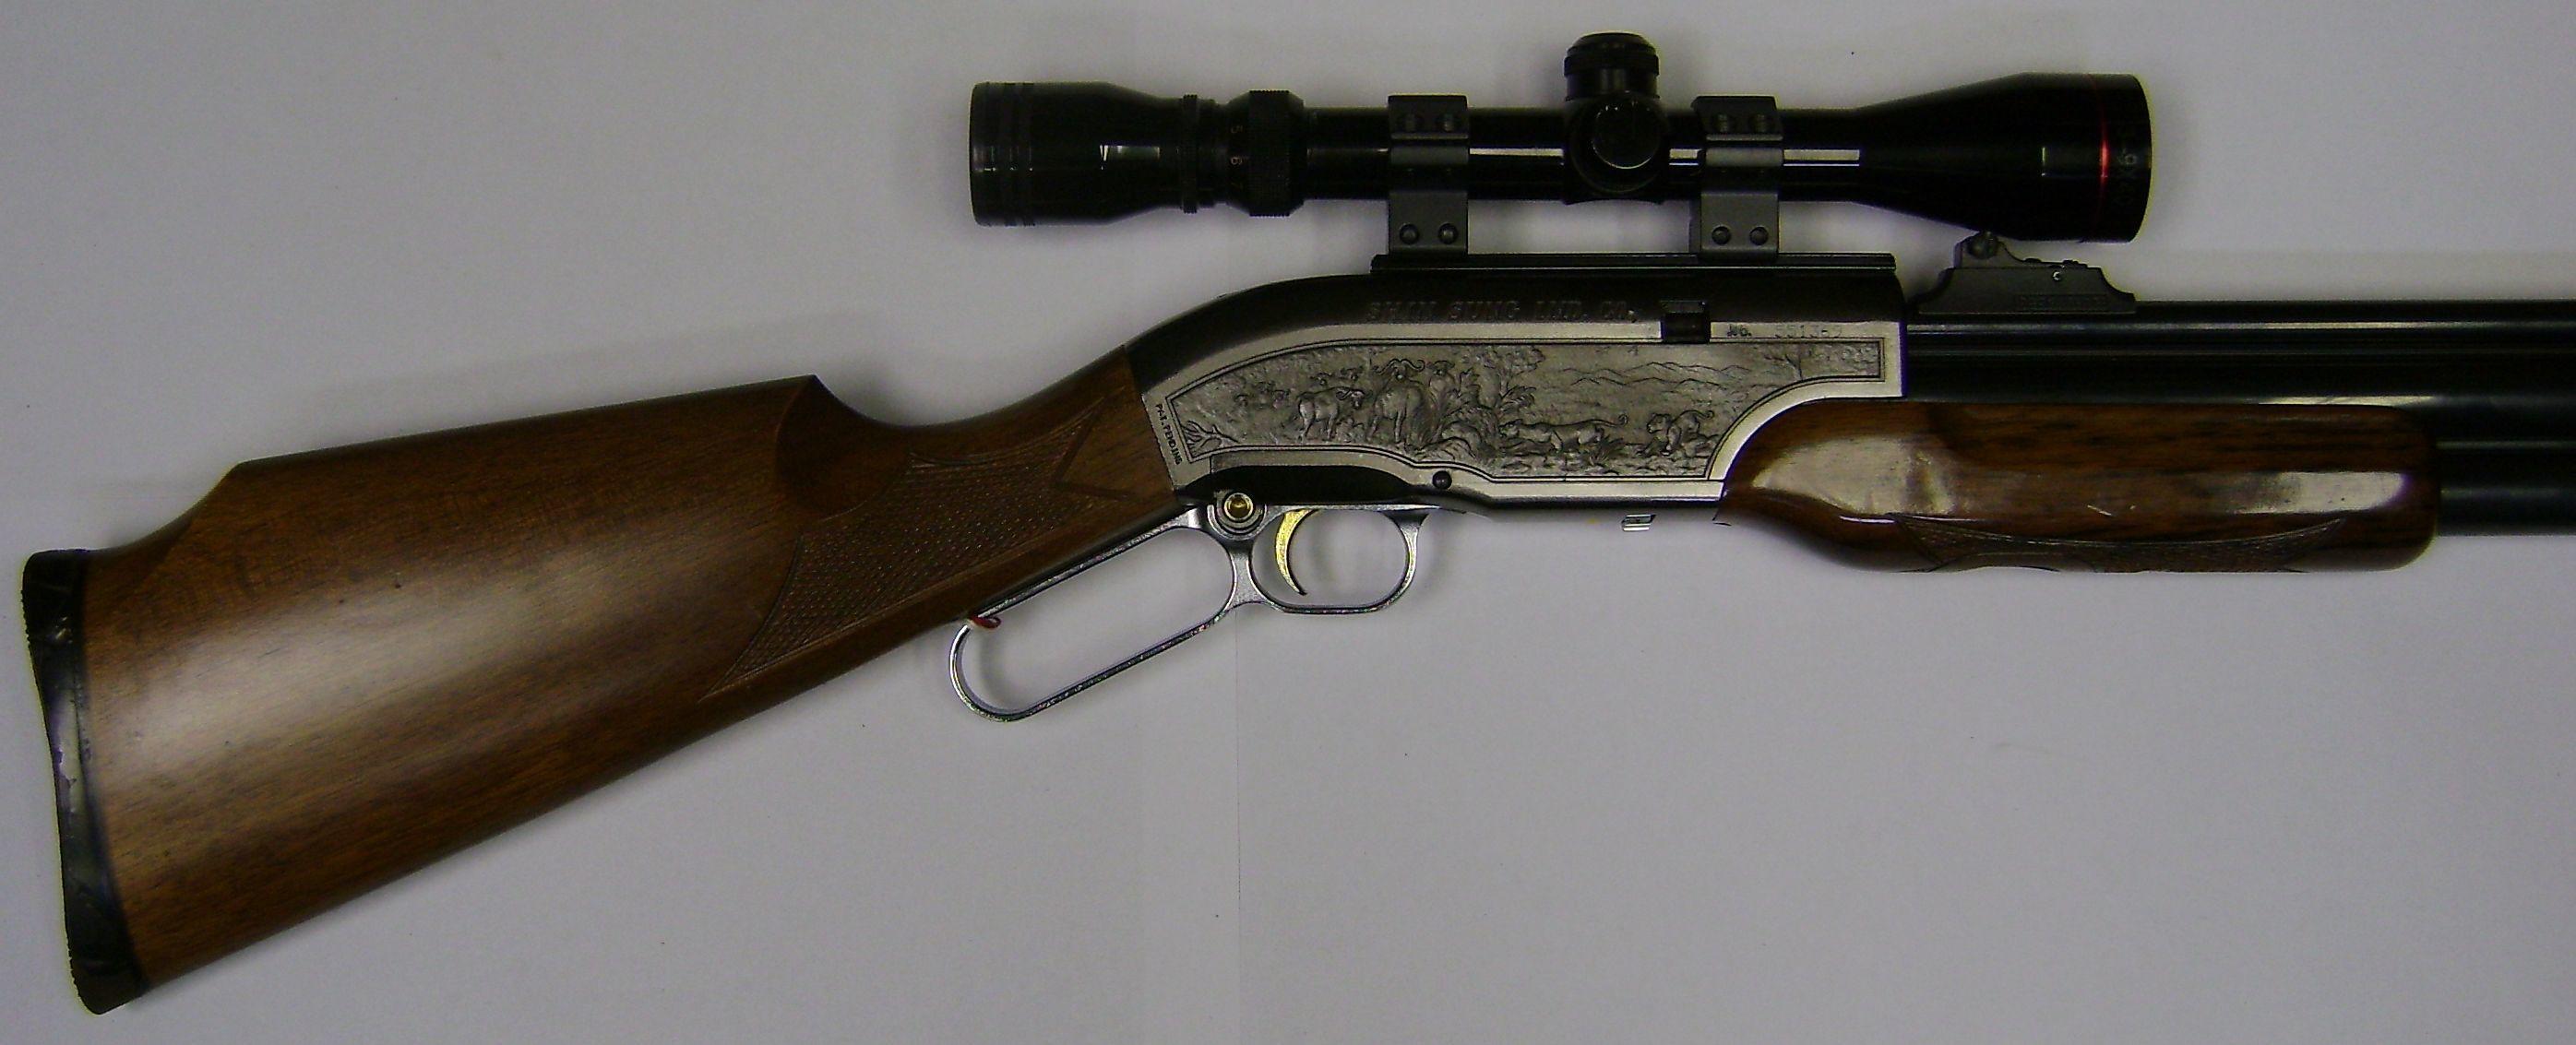 Auktion - Modern Sporting Guns am 13 12 2011 - LotSearch de